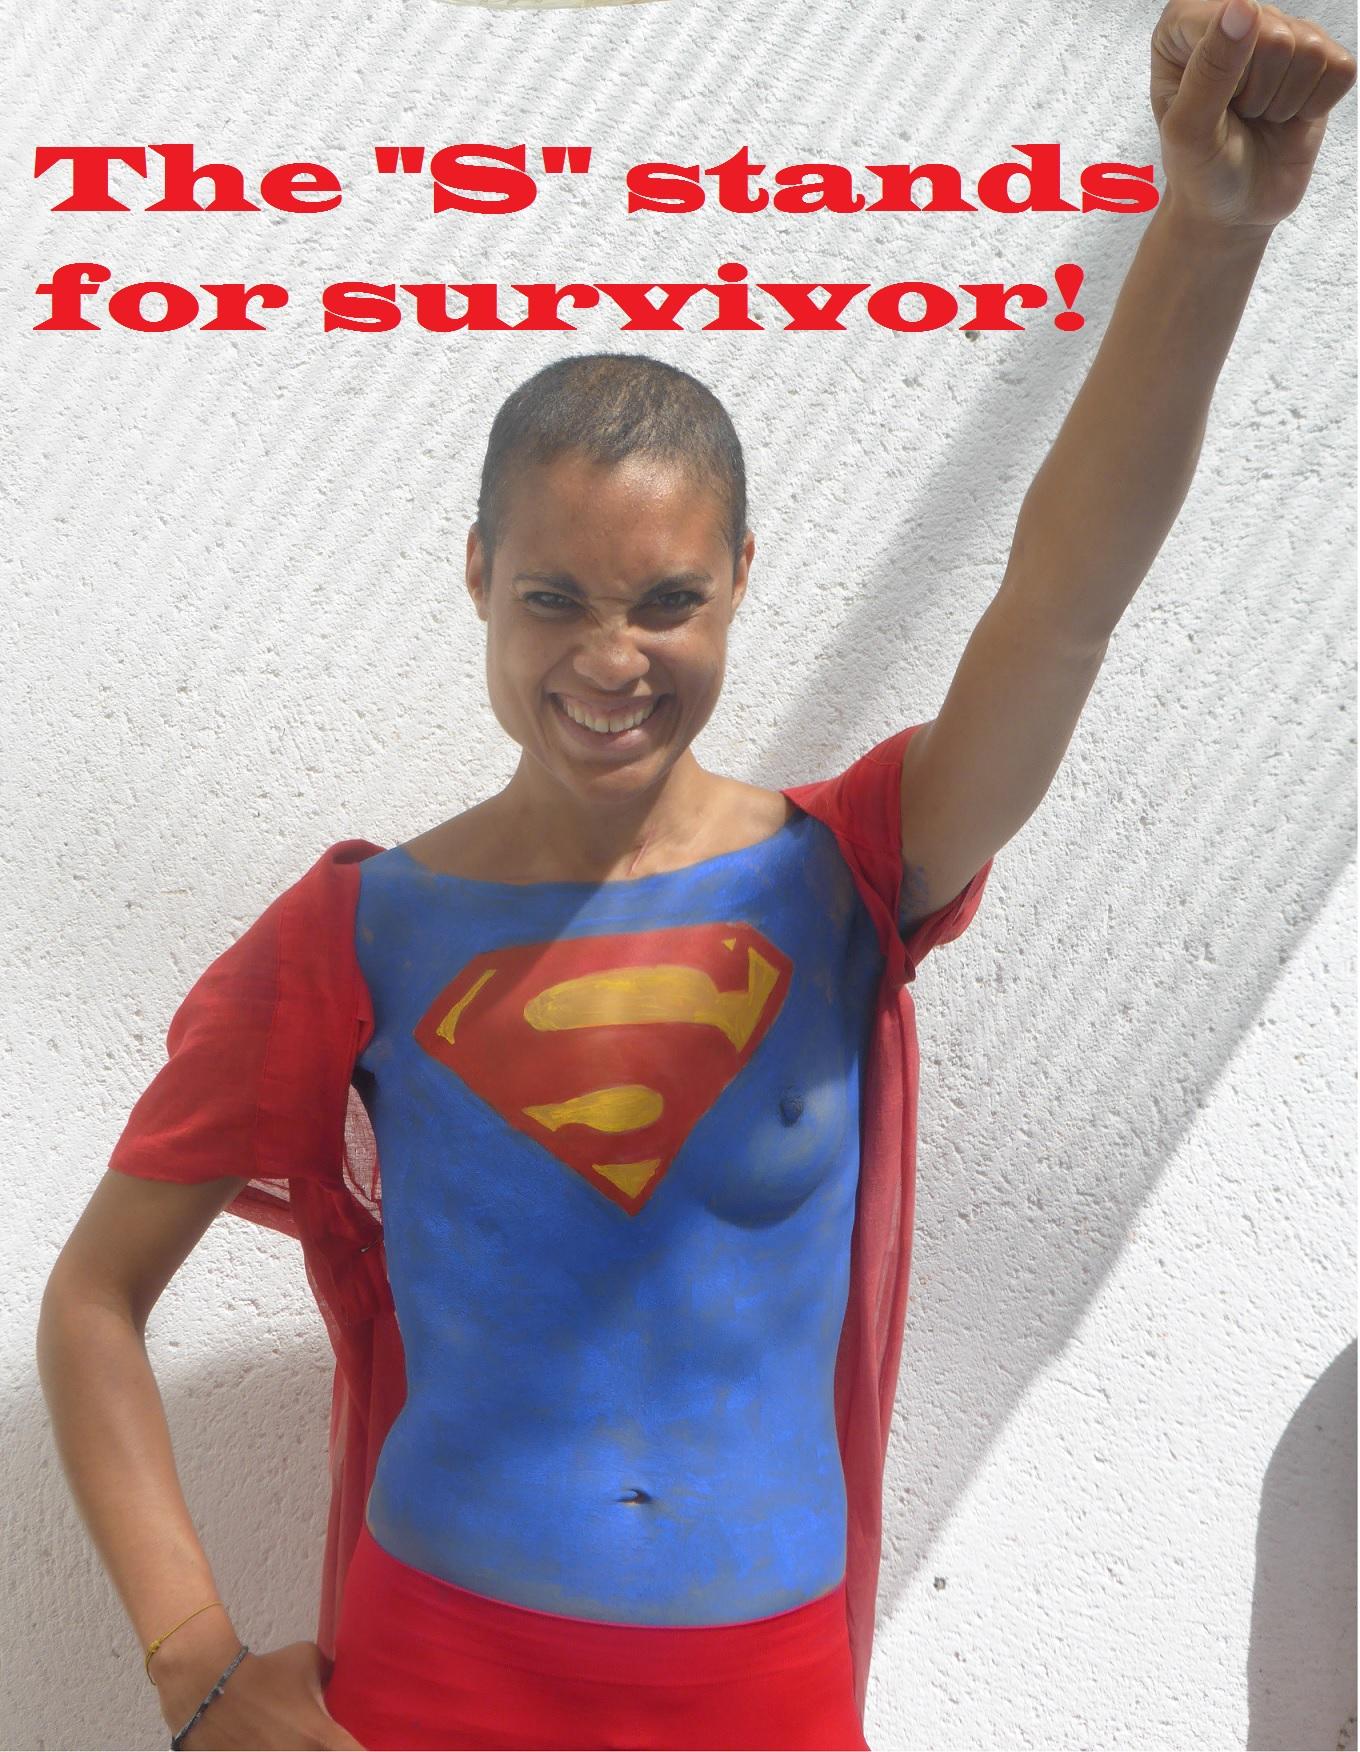 superman2 vrai avec phrase